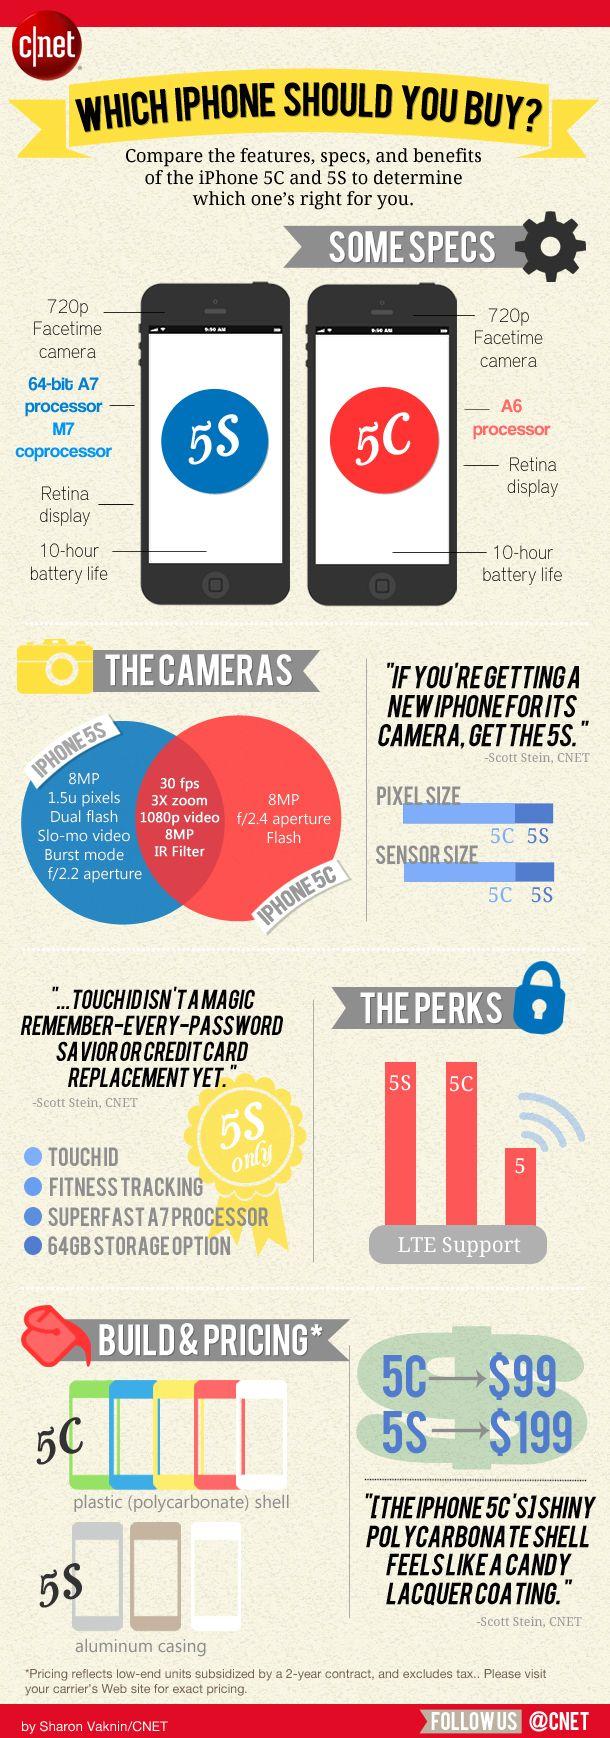 Www etradesupply com media uploaded iphone 5c vs iphone 5 screen jpg - Iphone 5s Vs 5c Which Should You Buy Infographic Infographic Iphone 5s And Iphone